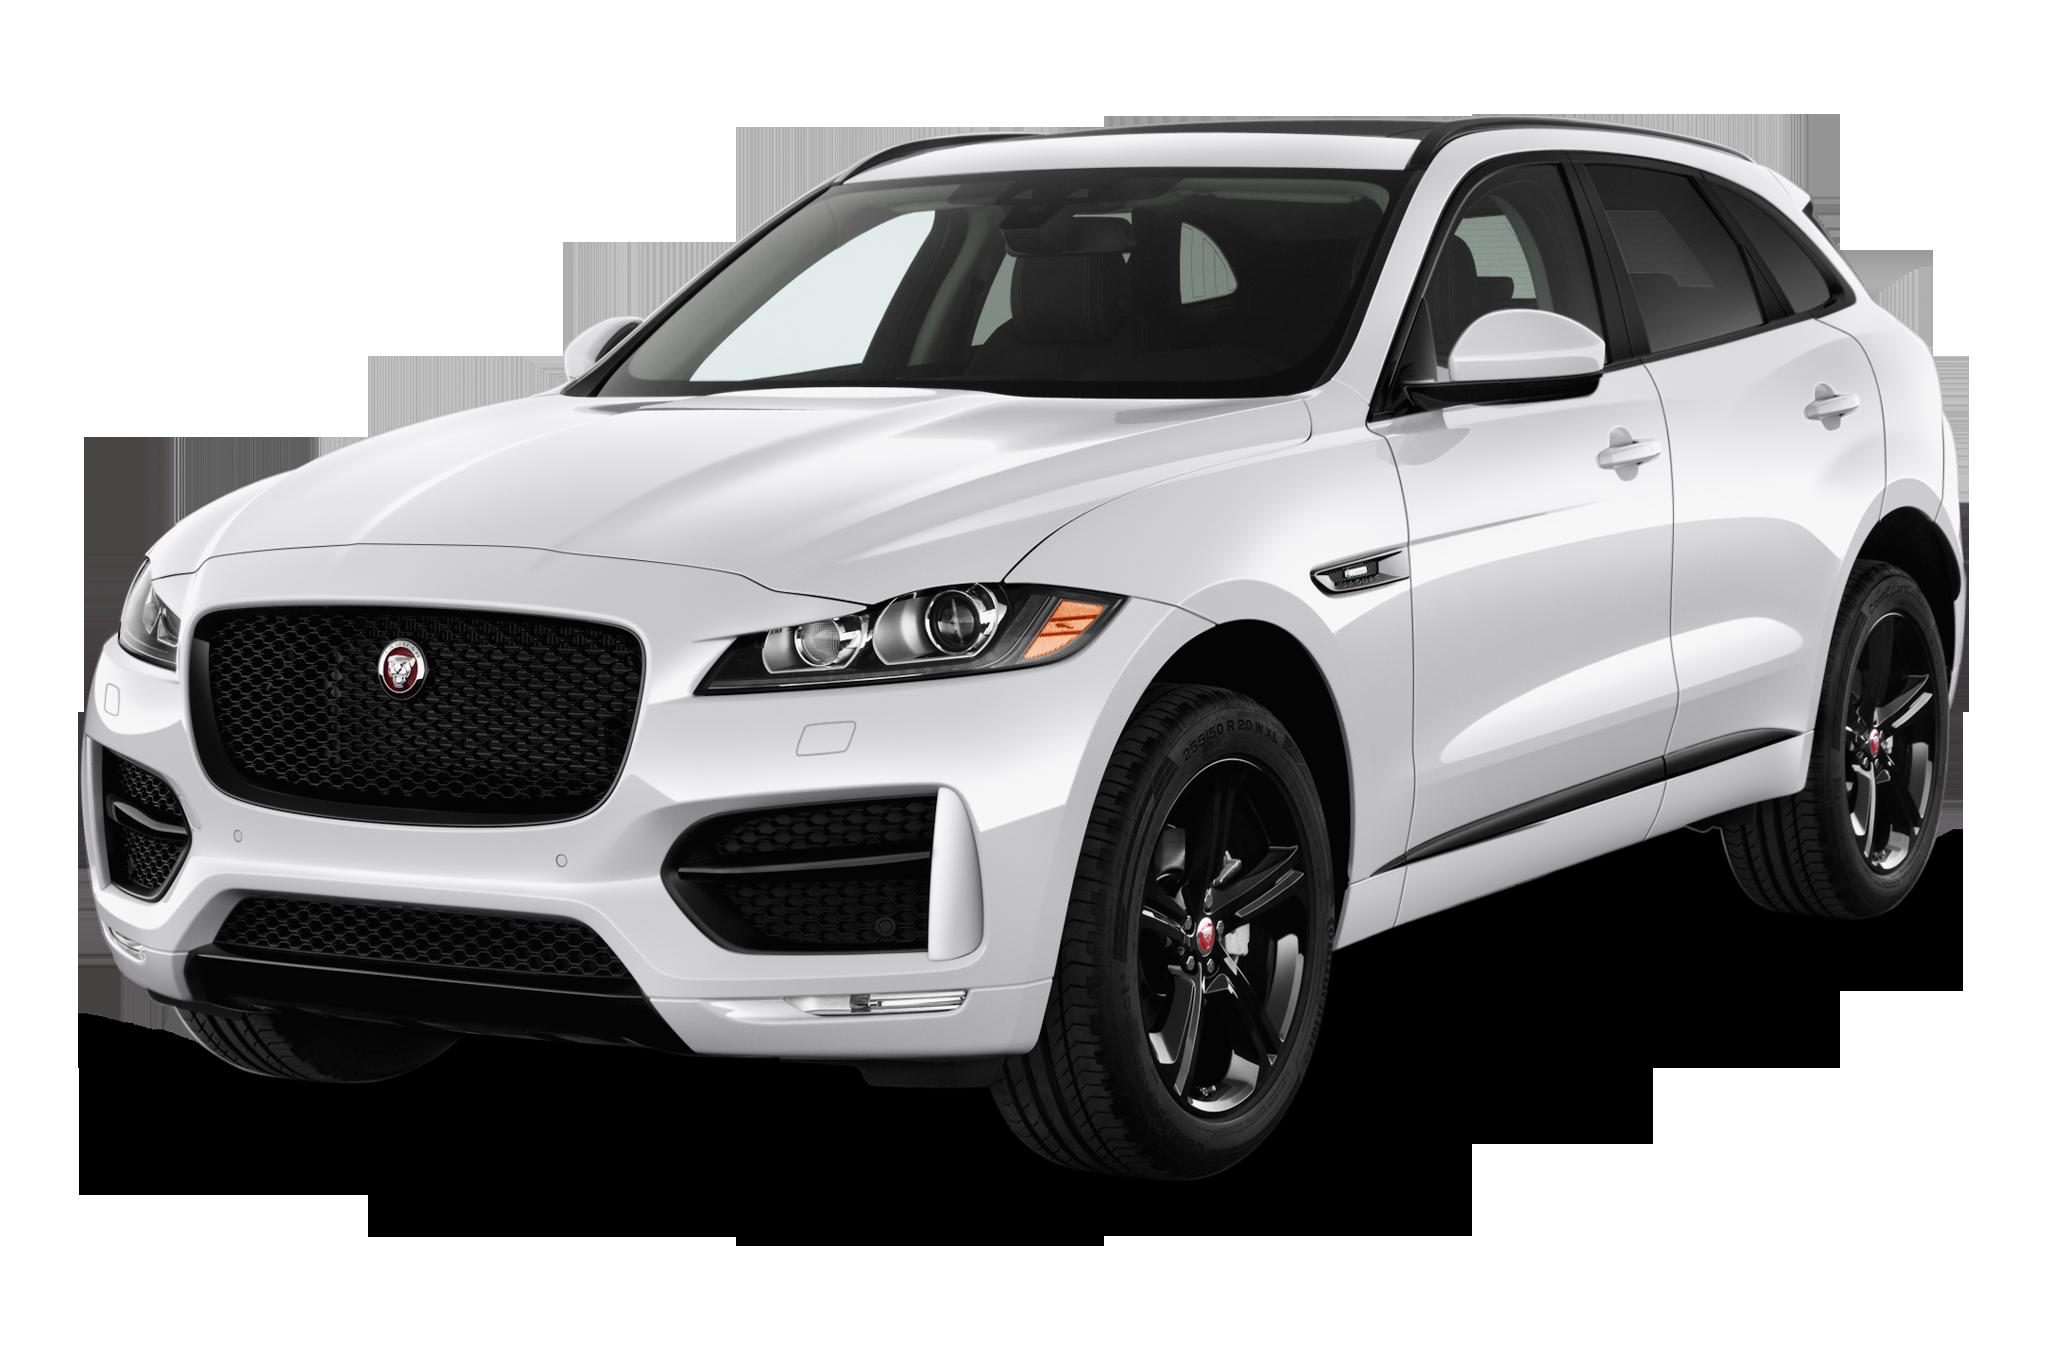 2018 jaguar f pace overview msn autos rh msn com